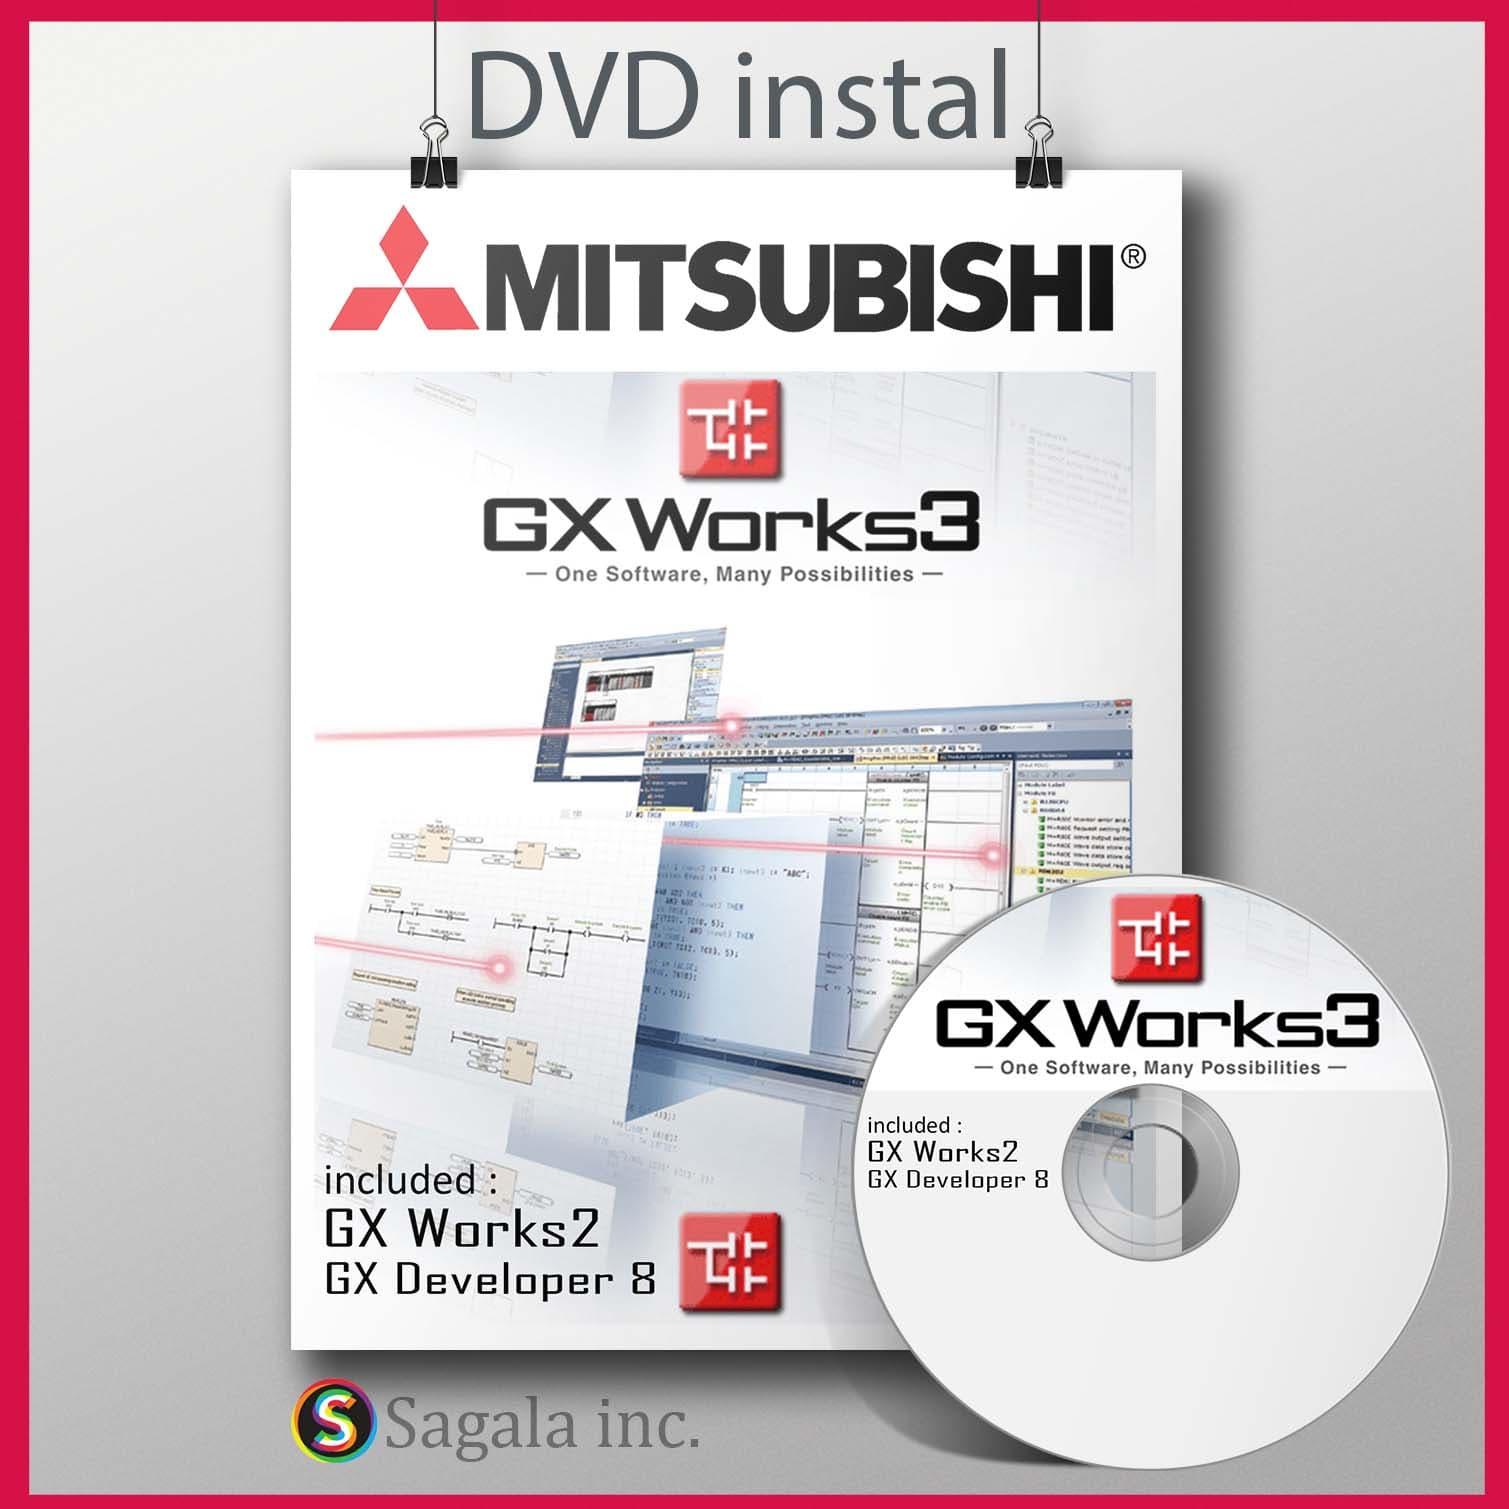 gx works 3 gx work 3 bonus gx works 2 gx work 2 GX